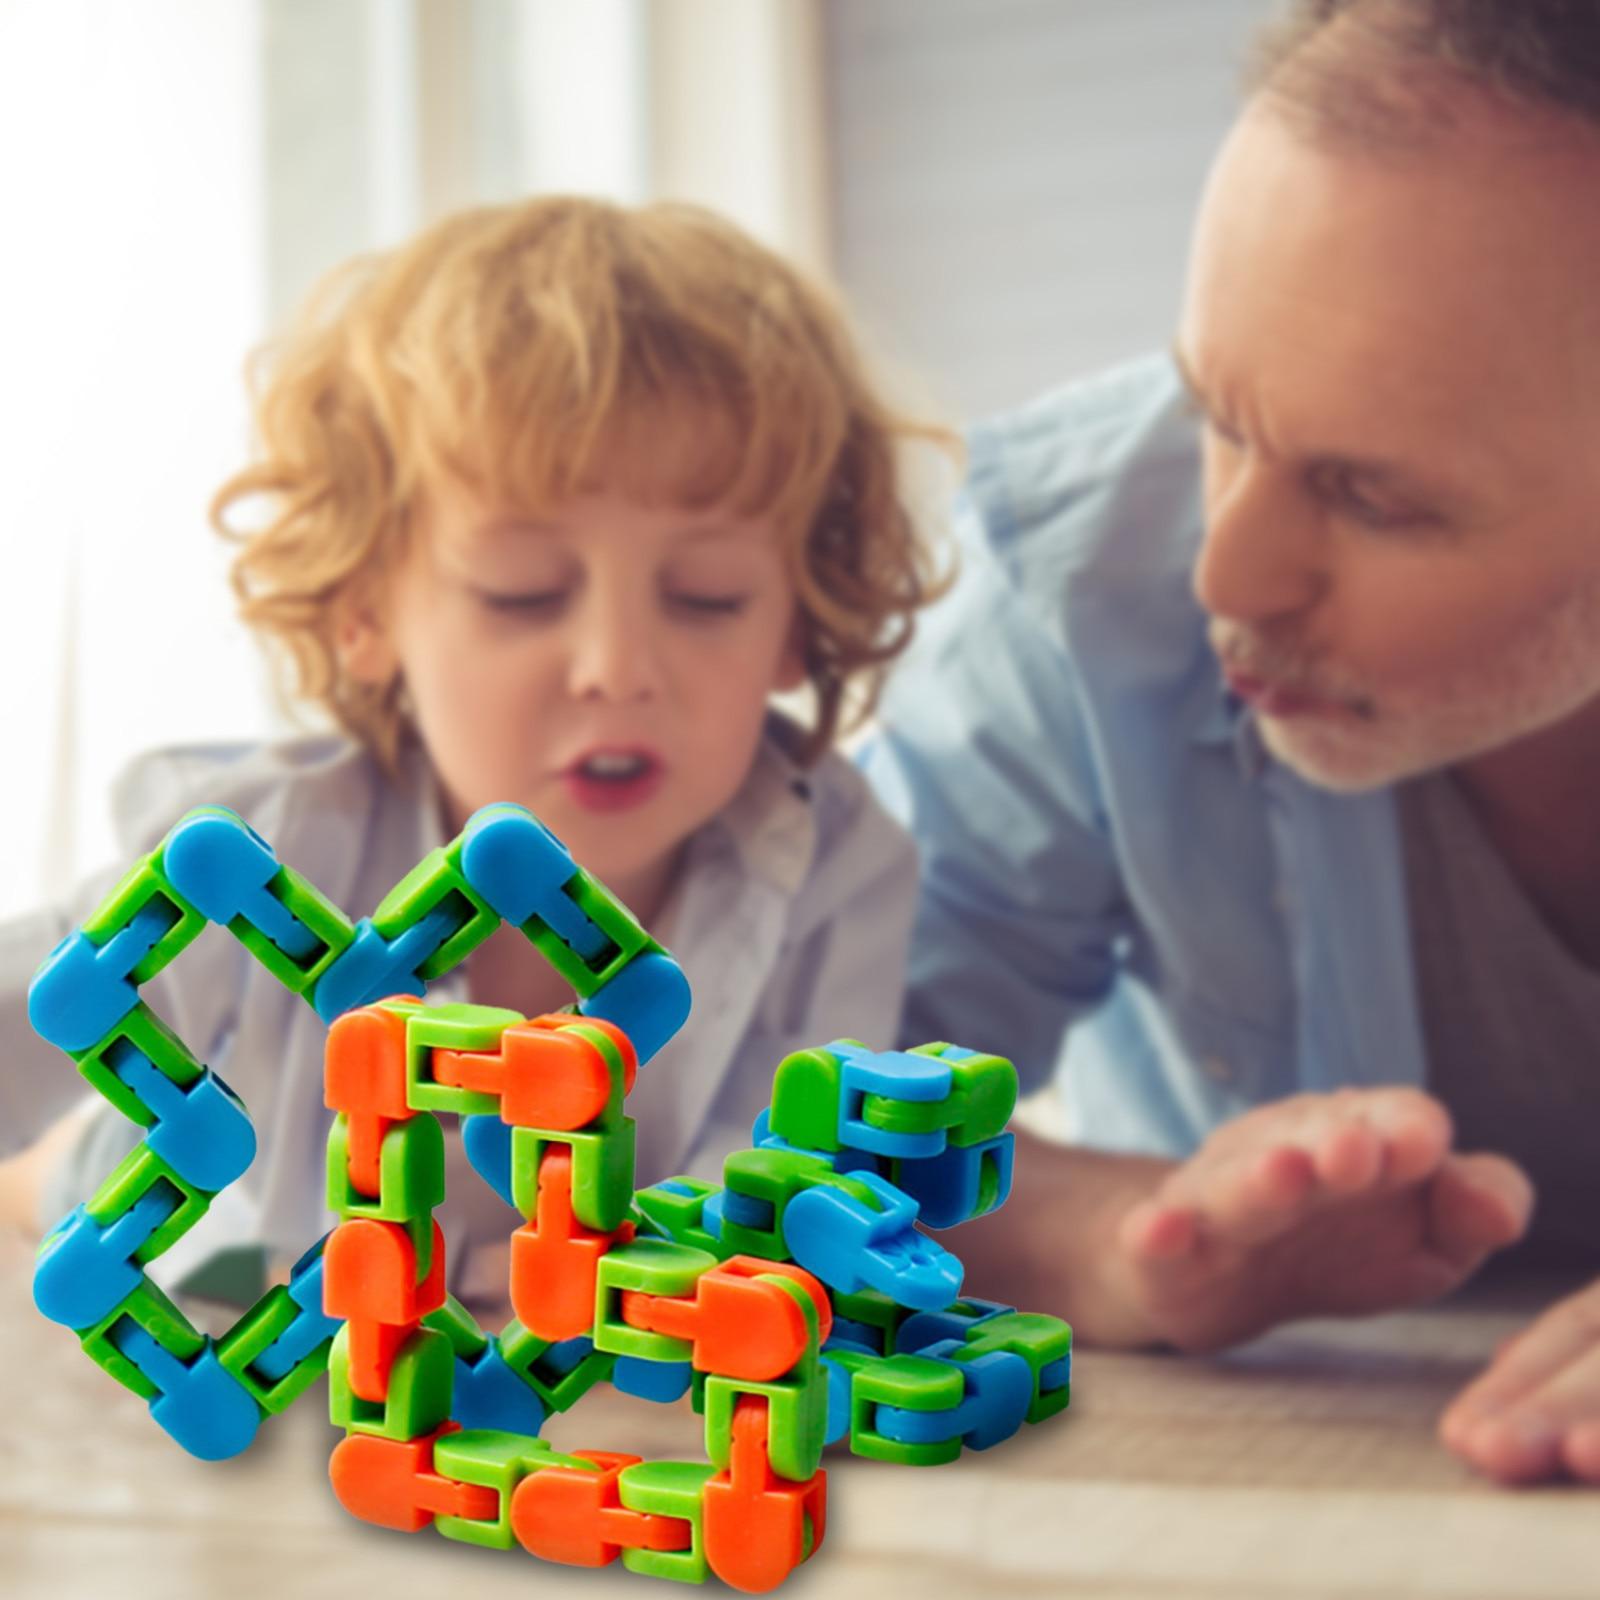 Fidget-Toys Stress Tangle Relief-Rotate Sensory Colorful Shape 24-Bit Puzzle Zabawki